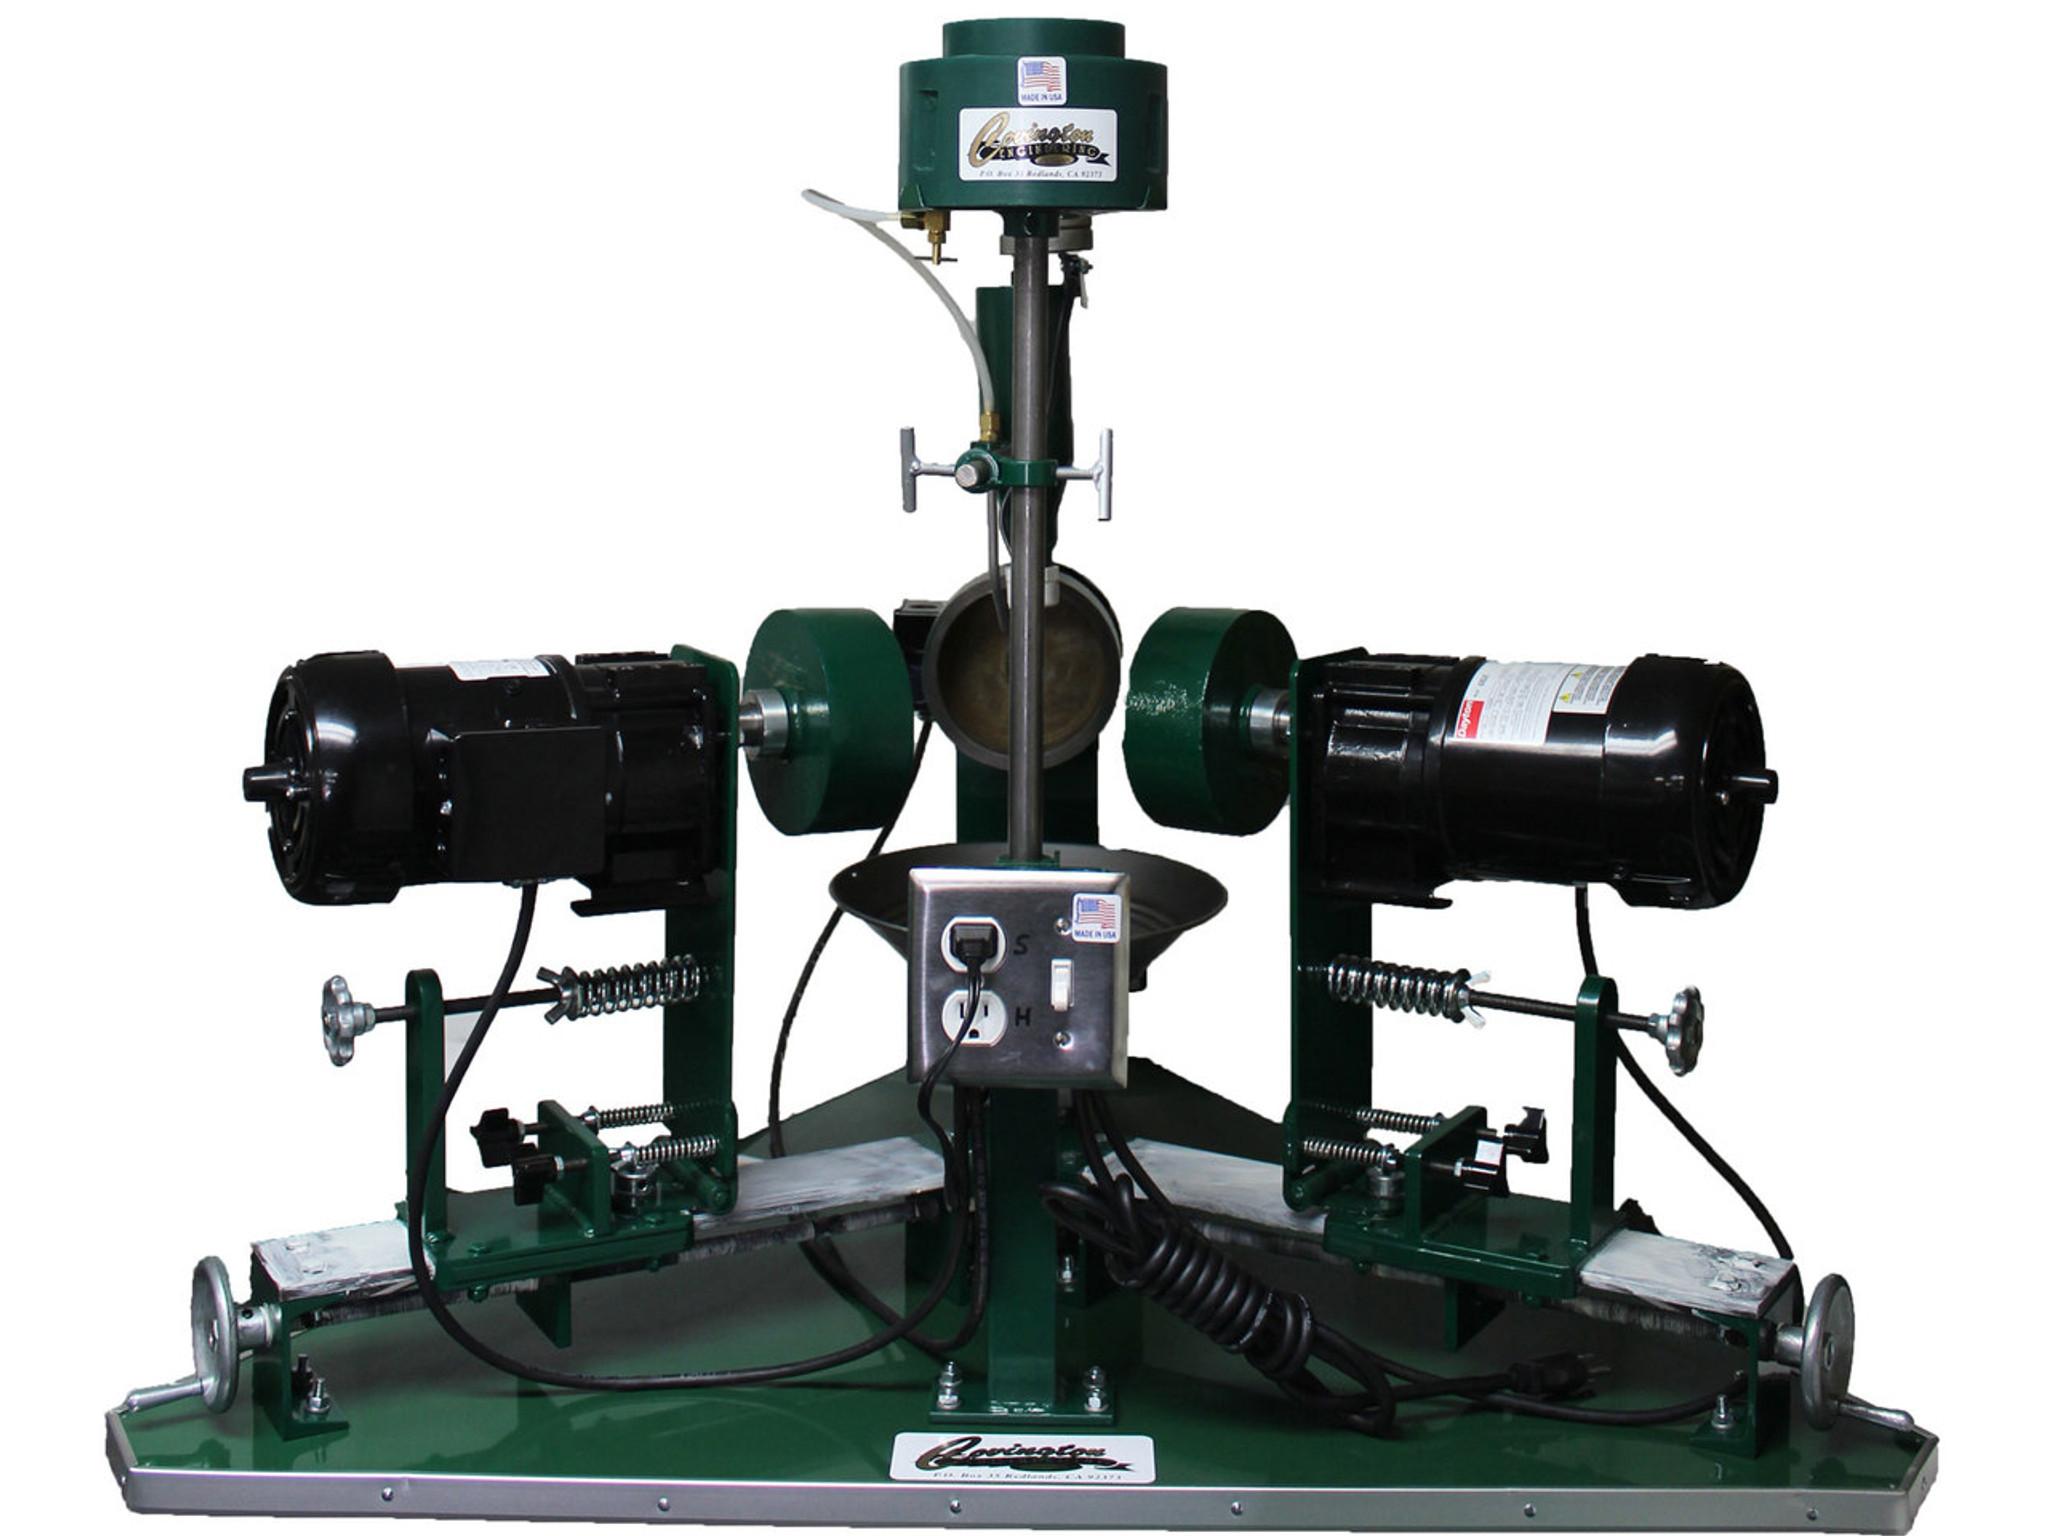 Lapidary Equipment For Beginners